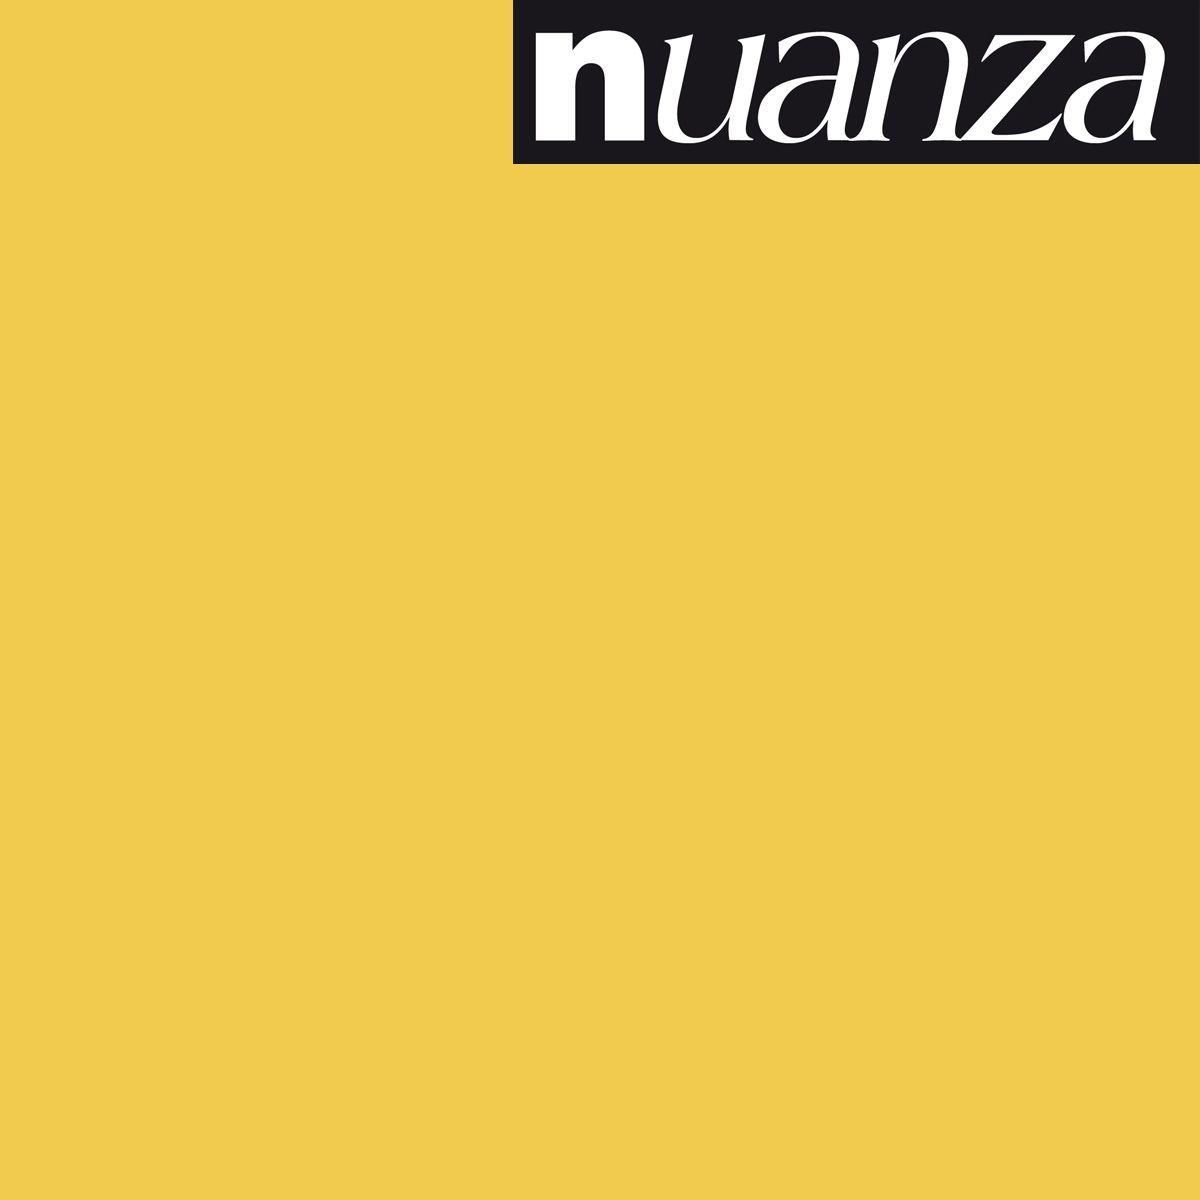 Peinture moutarde satin multisupports Nuanza 0.5l